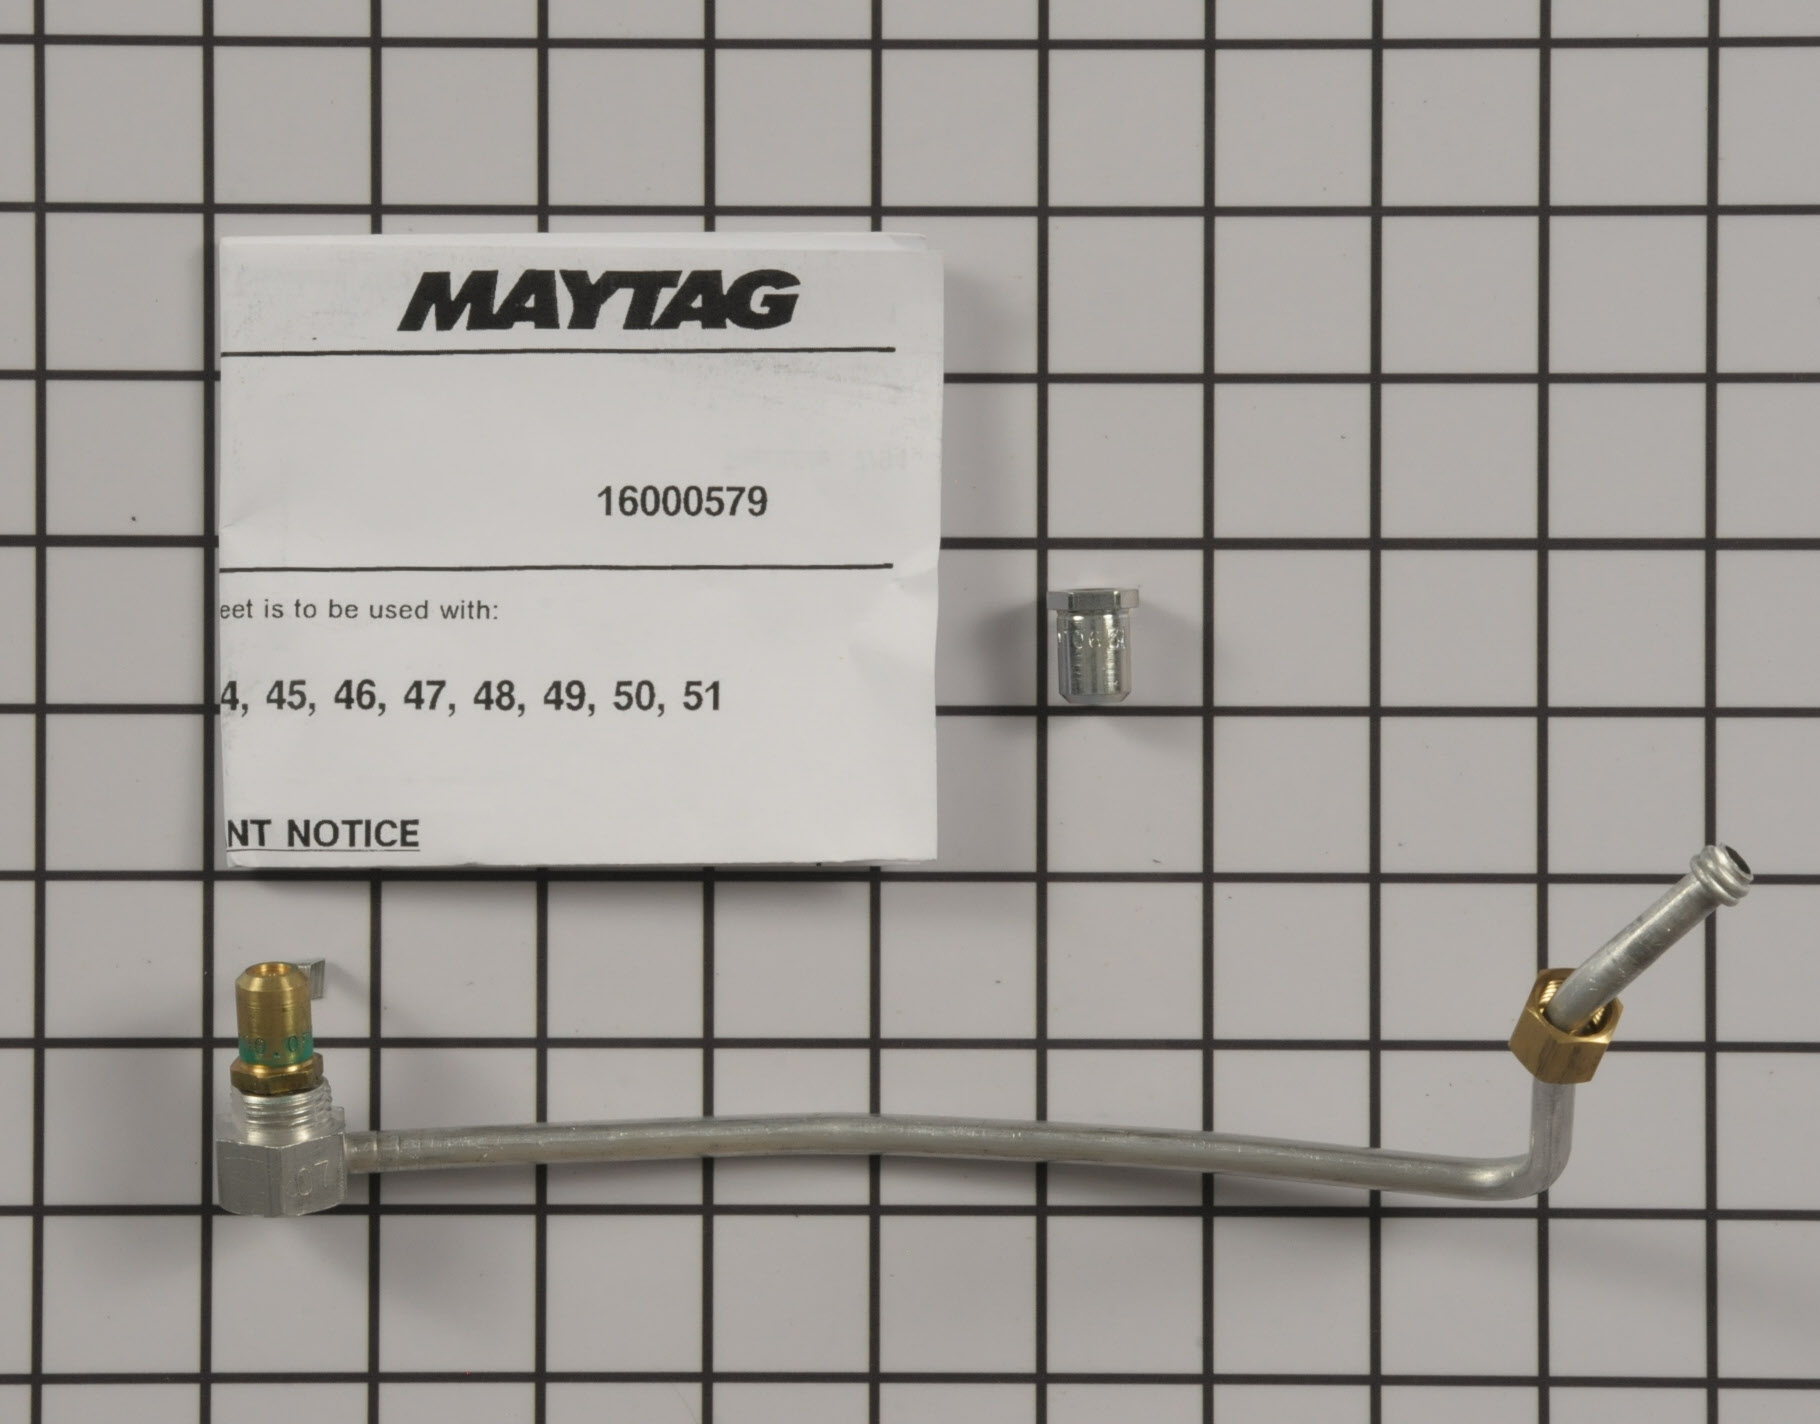 Maytag Range/Stove/Oven Part # 12200047 - Surface Burner Orifice Holder